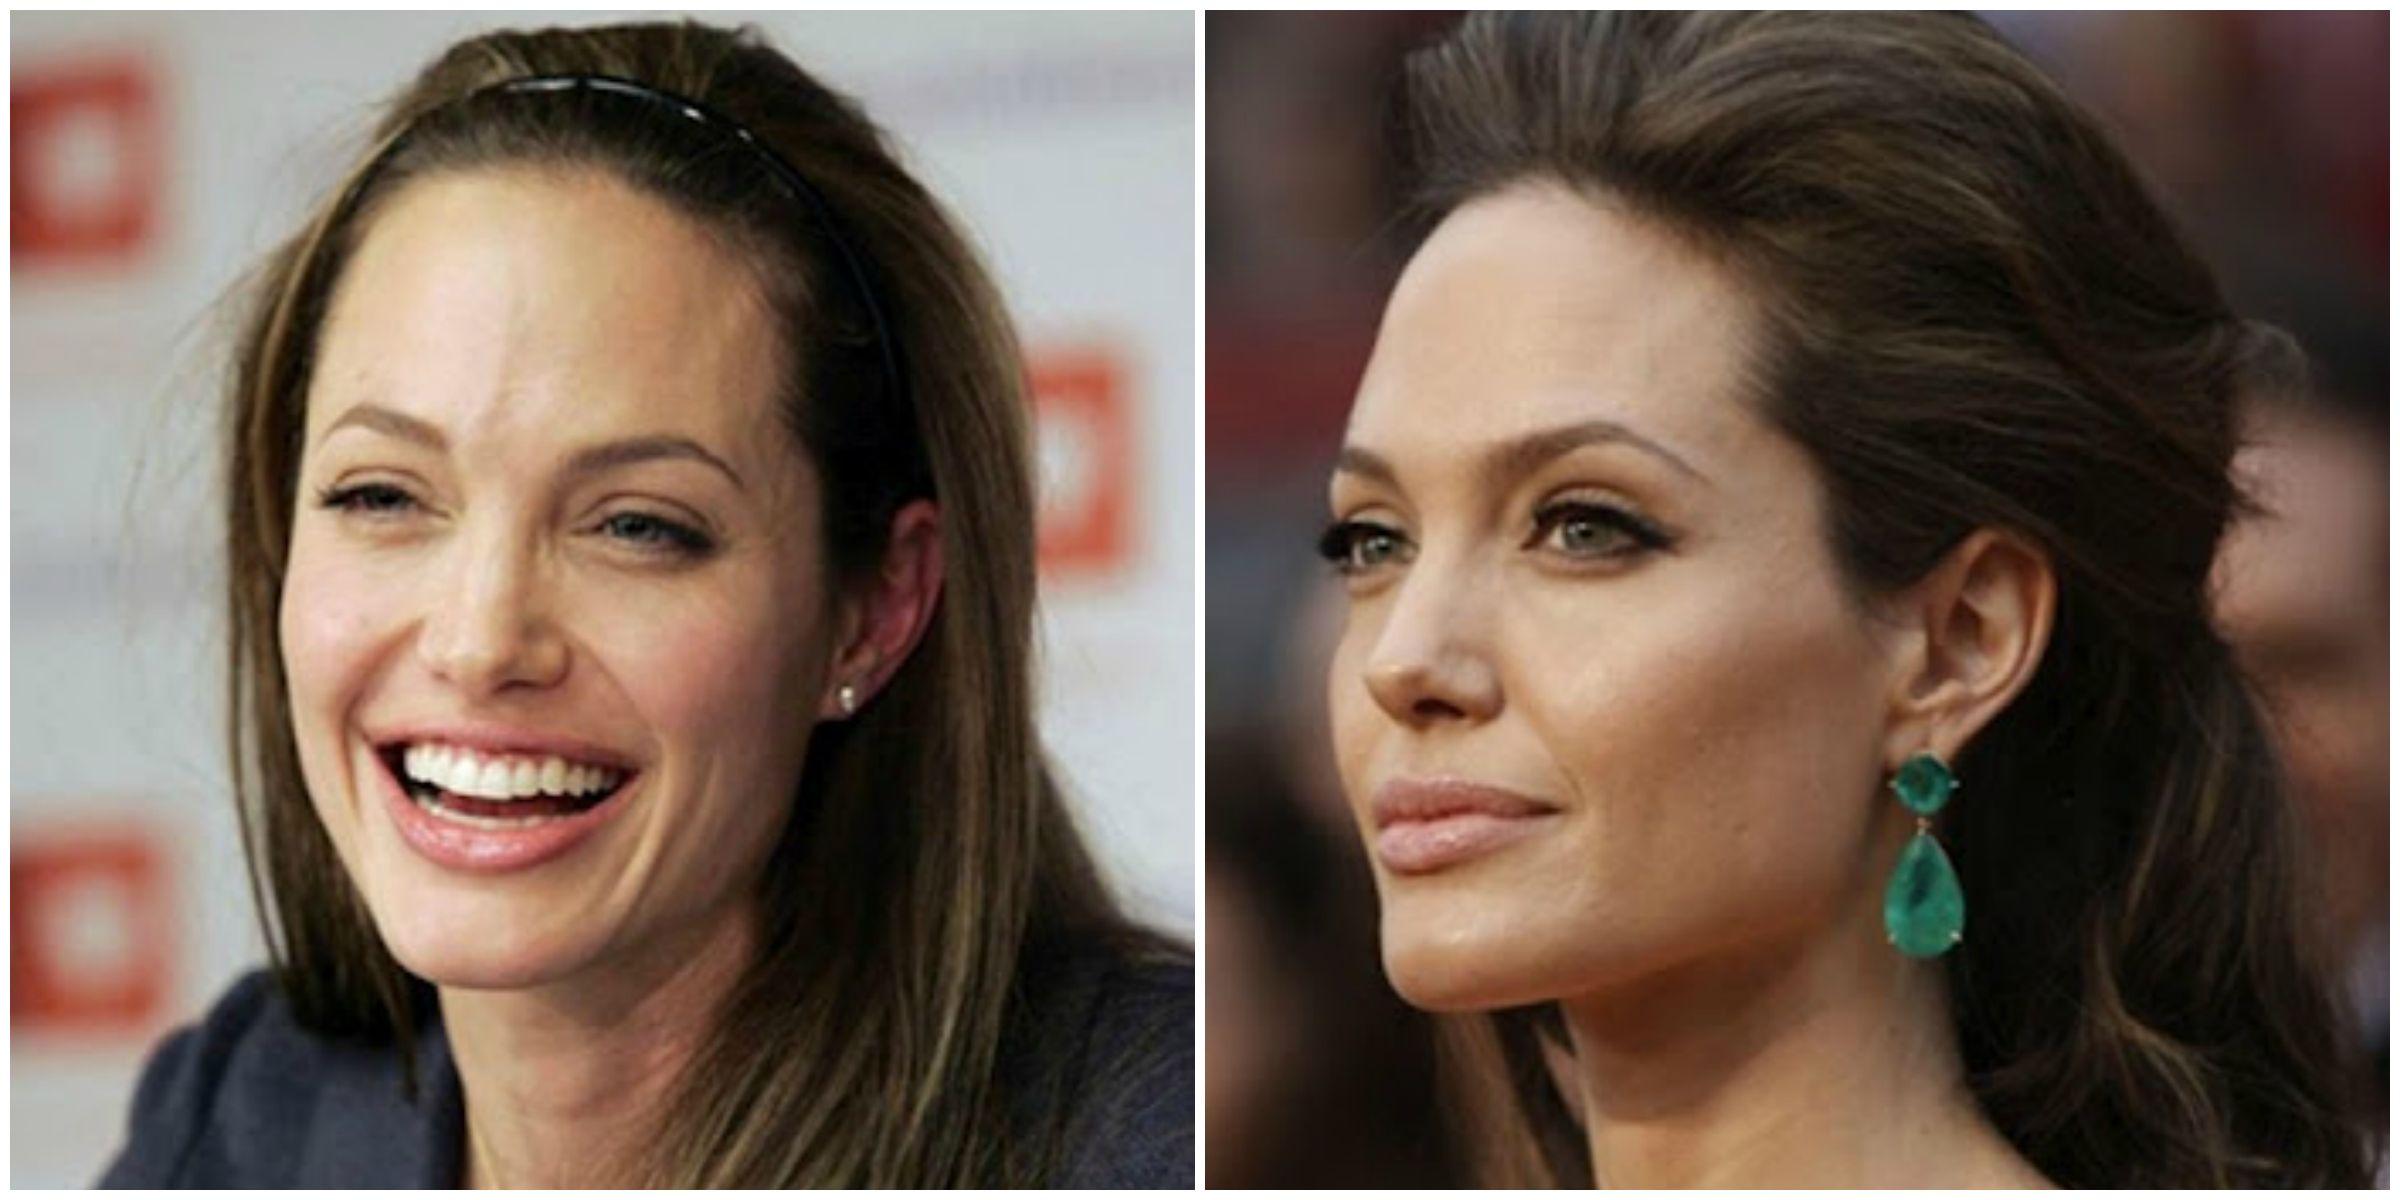 Angelina jolie photos without makeup 10 best ambika anand images on Pinterest Adah sharma, Ayeza